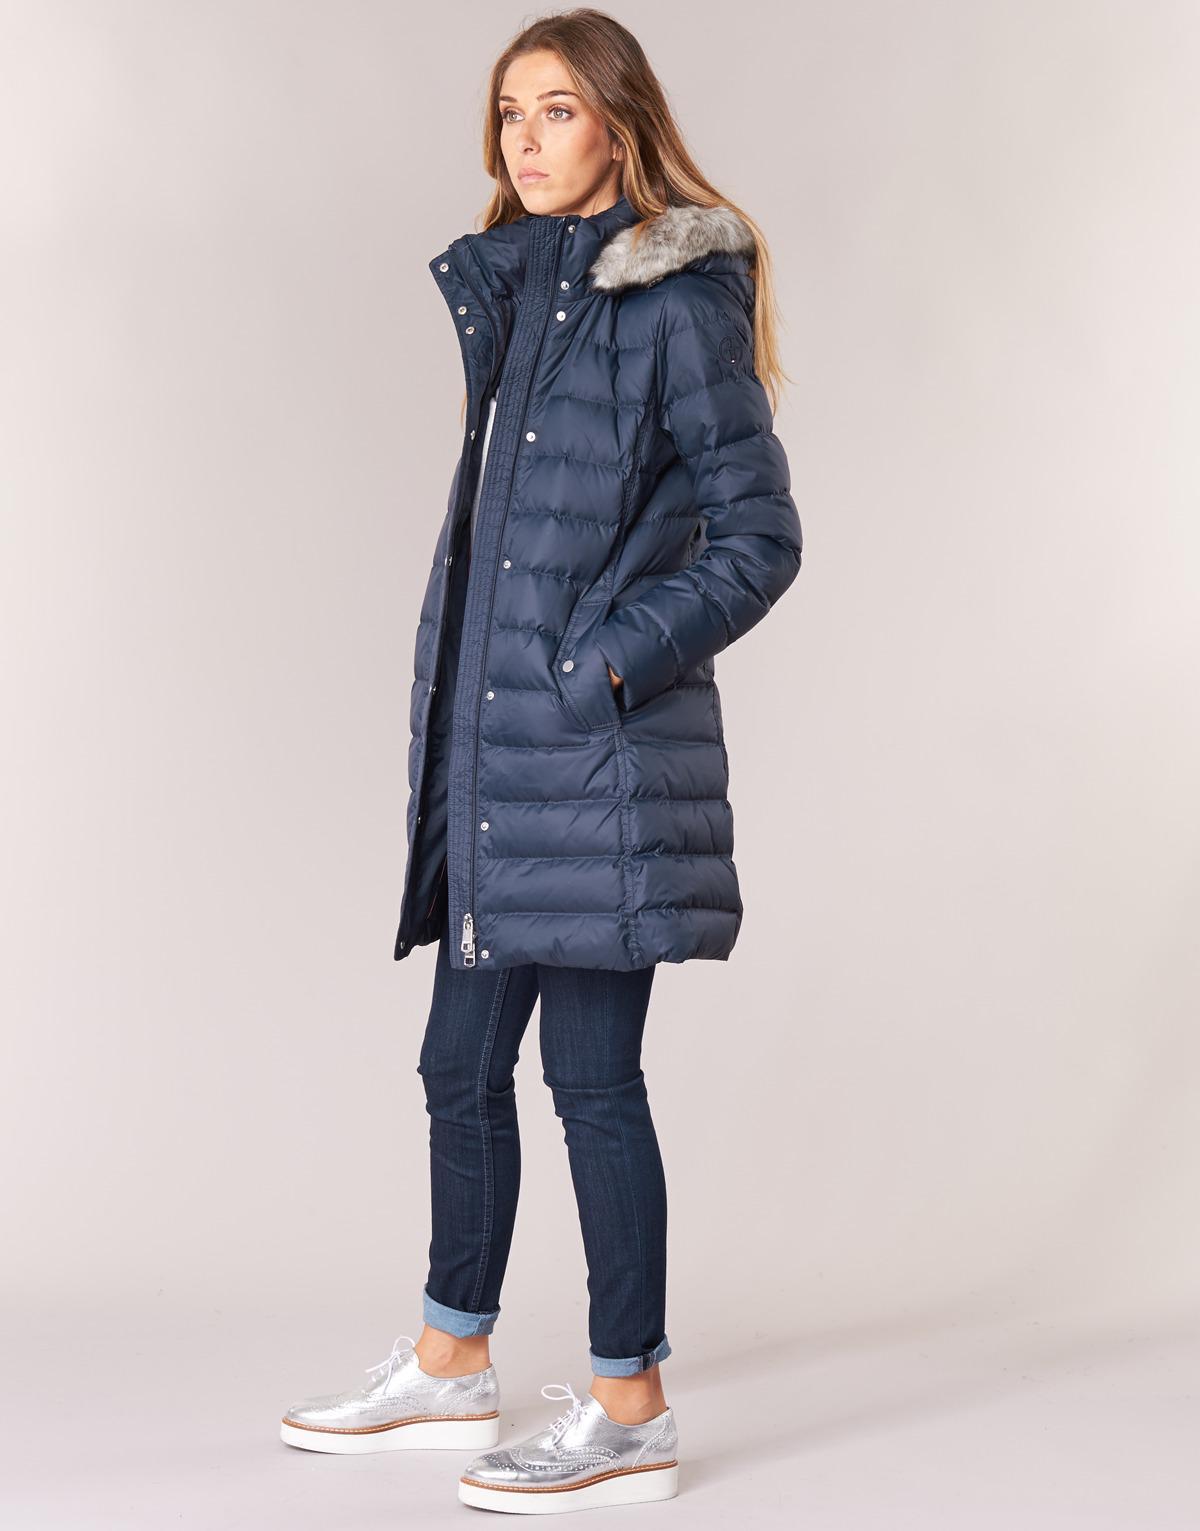 7e7869b7fbcc Tommy Hilfiger Tyra Down Coat Women s Jacket In Blue in Blue - Lyst